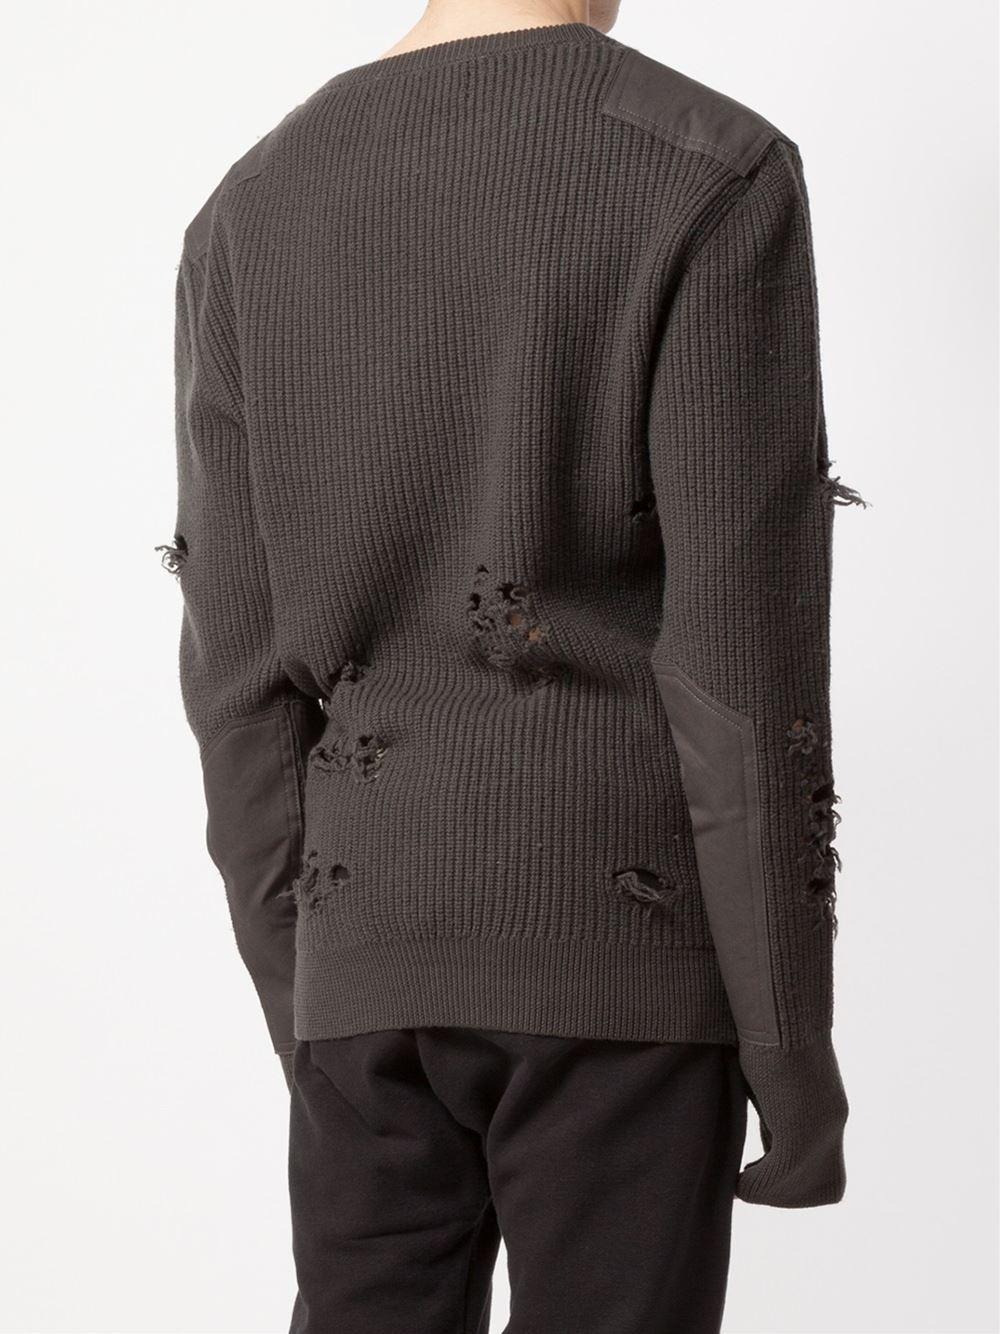 Yeezy Wool Distressed Knit Sweater in Black for Men